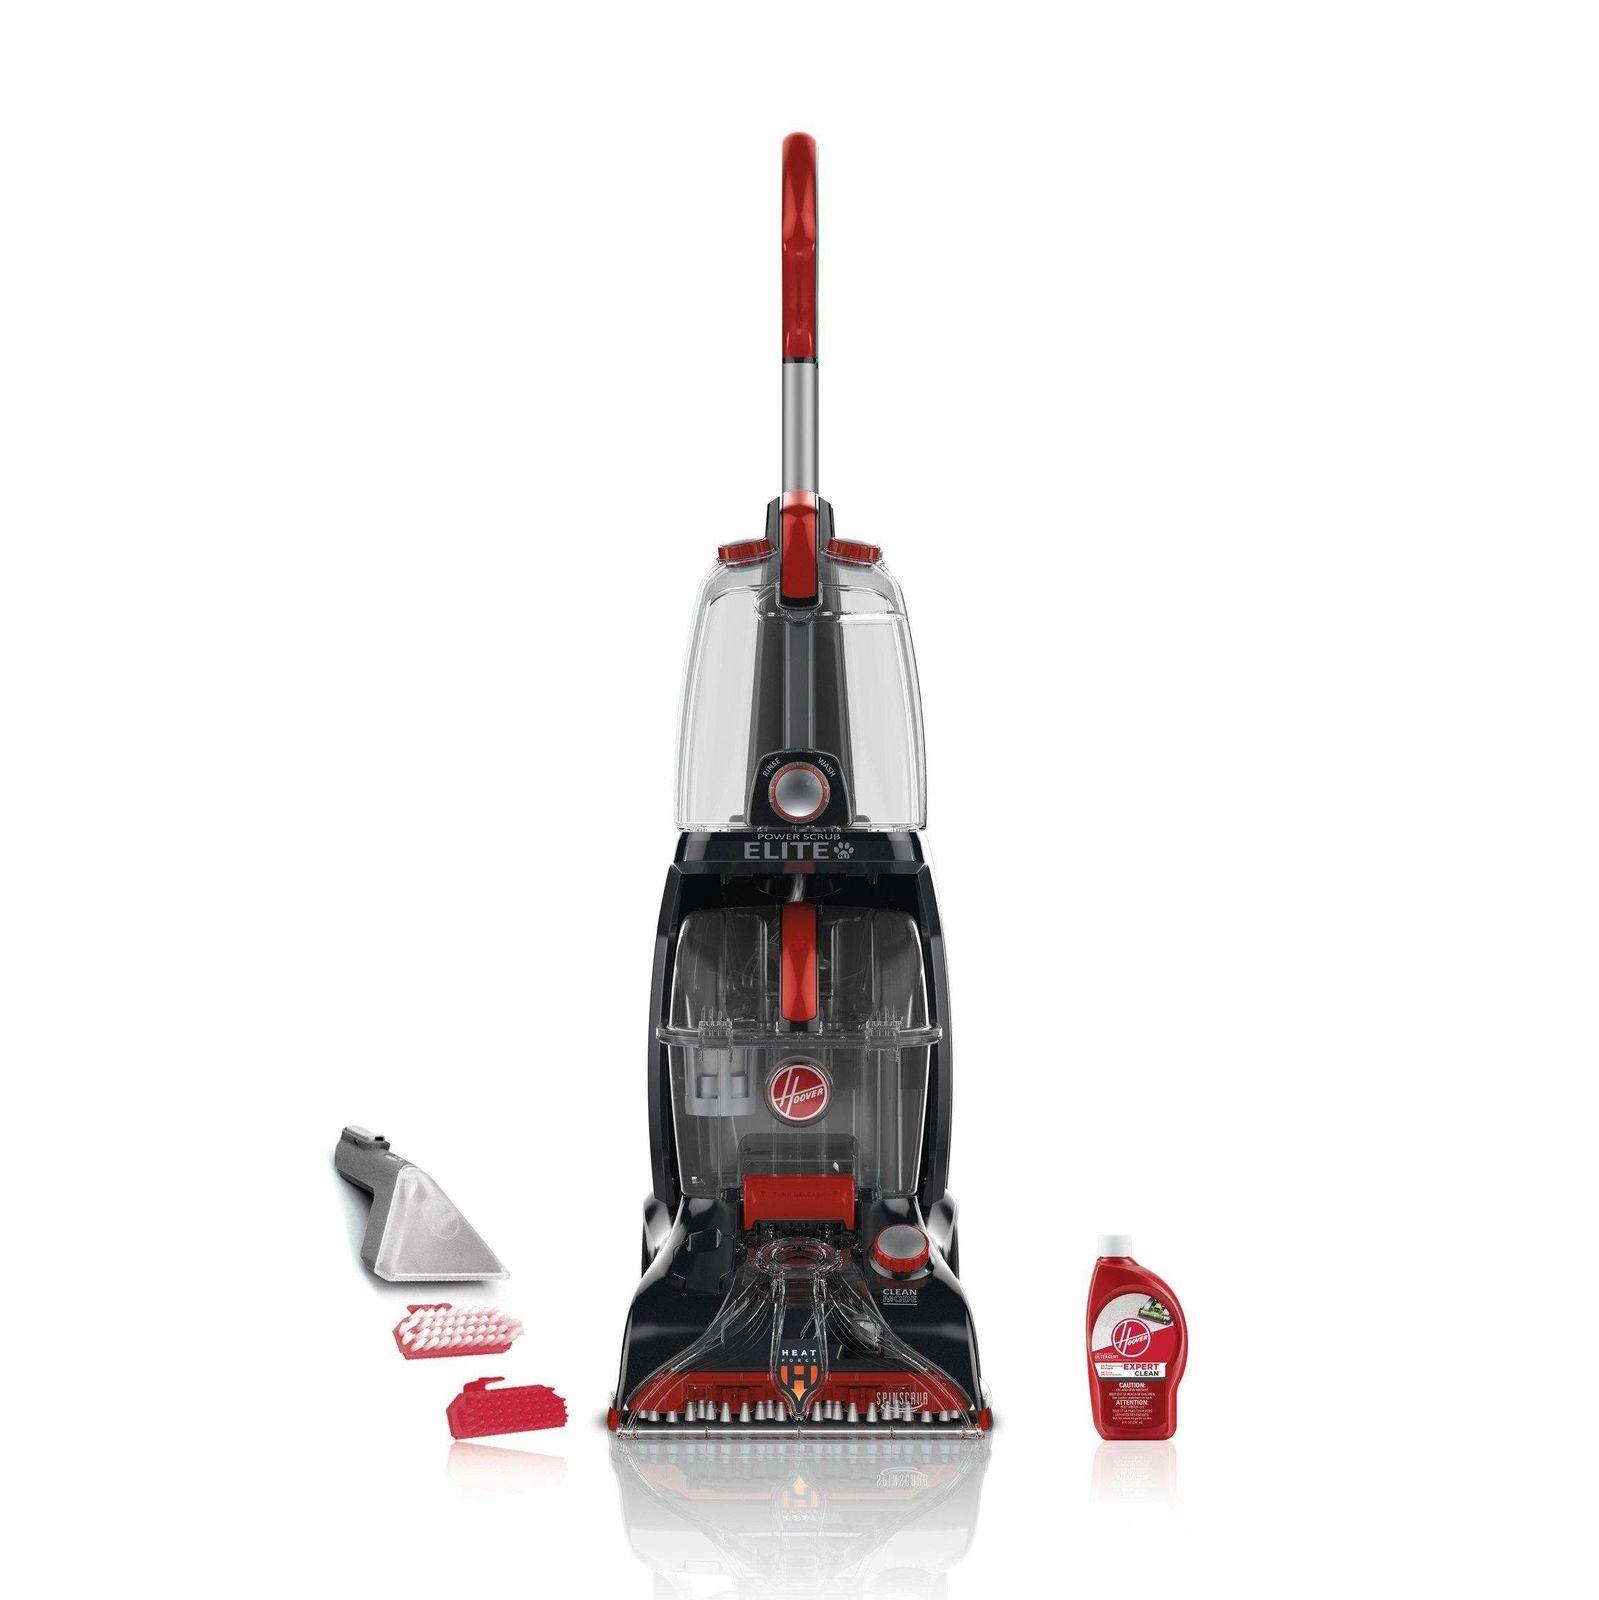 Hoover Power Scrub Elite Pet Carpet Cleaner (Refurbished) FH50251RM $72 after Code